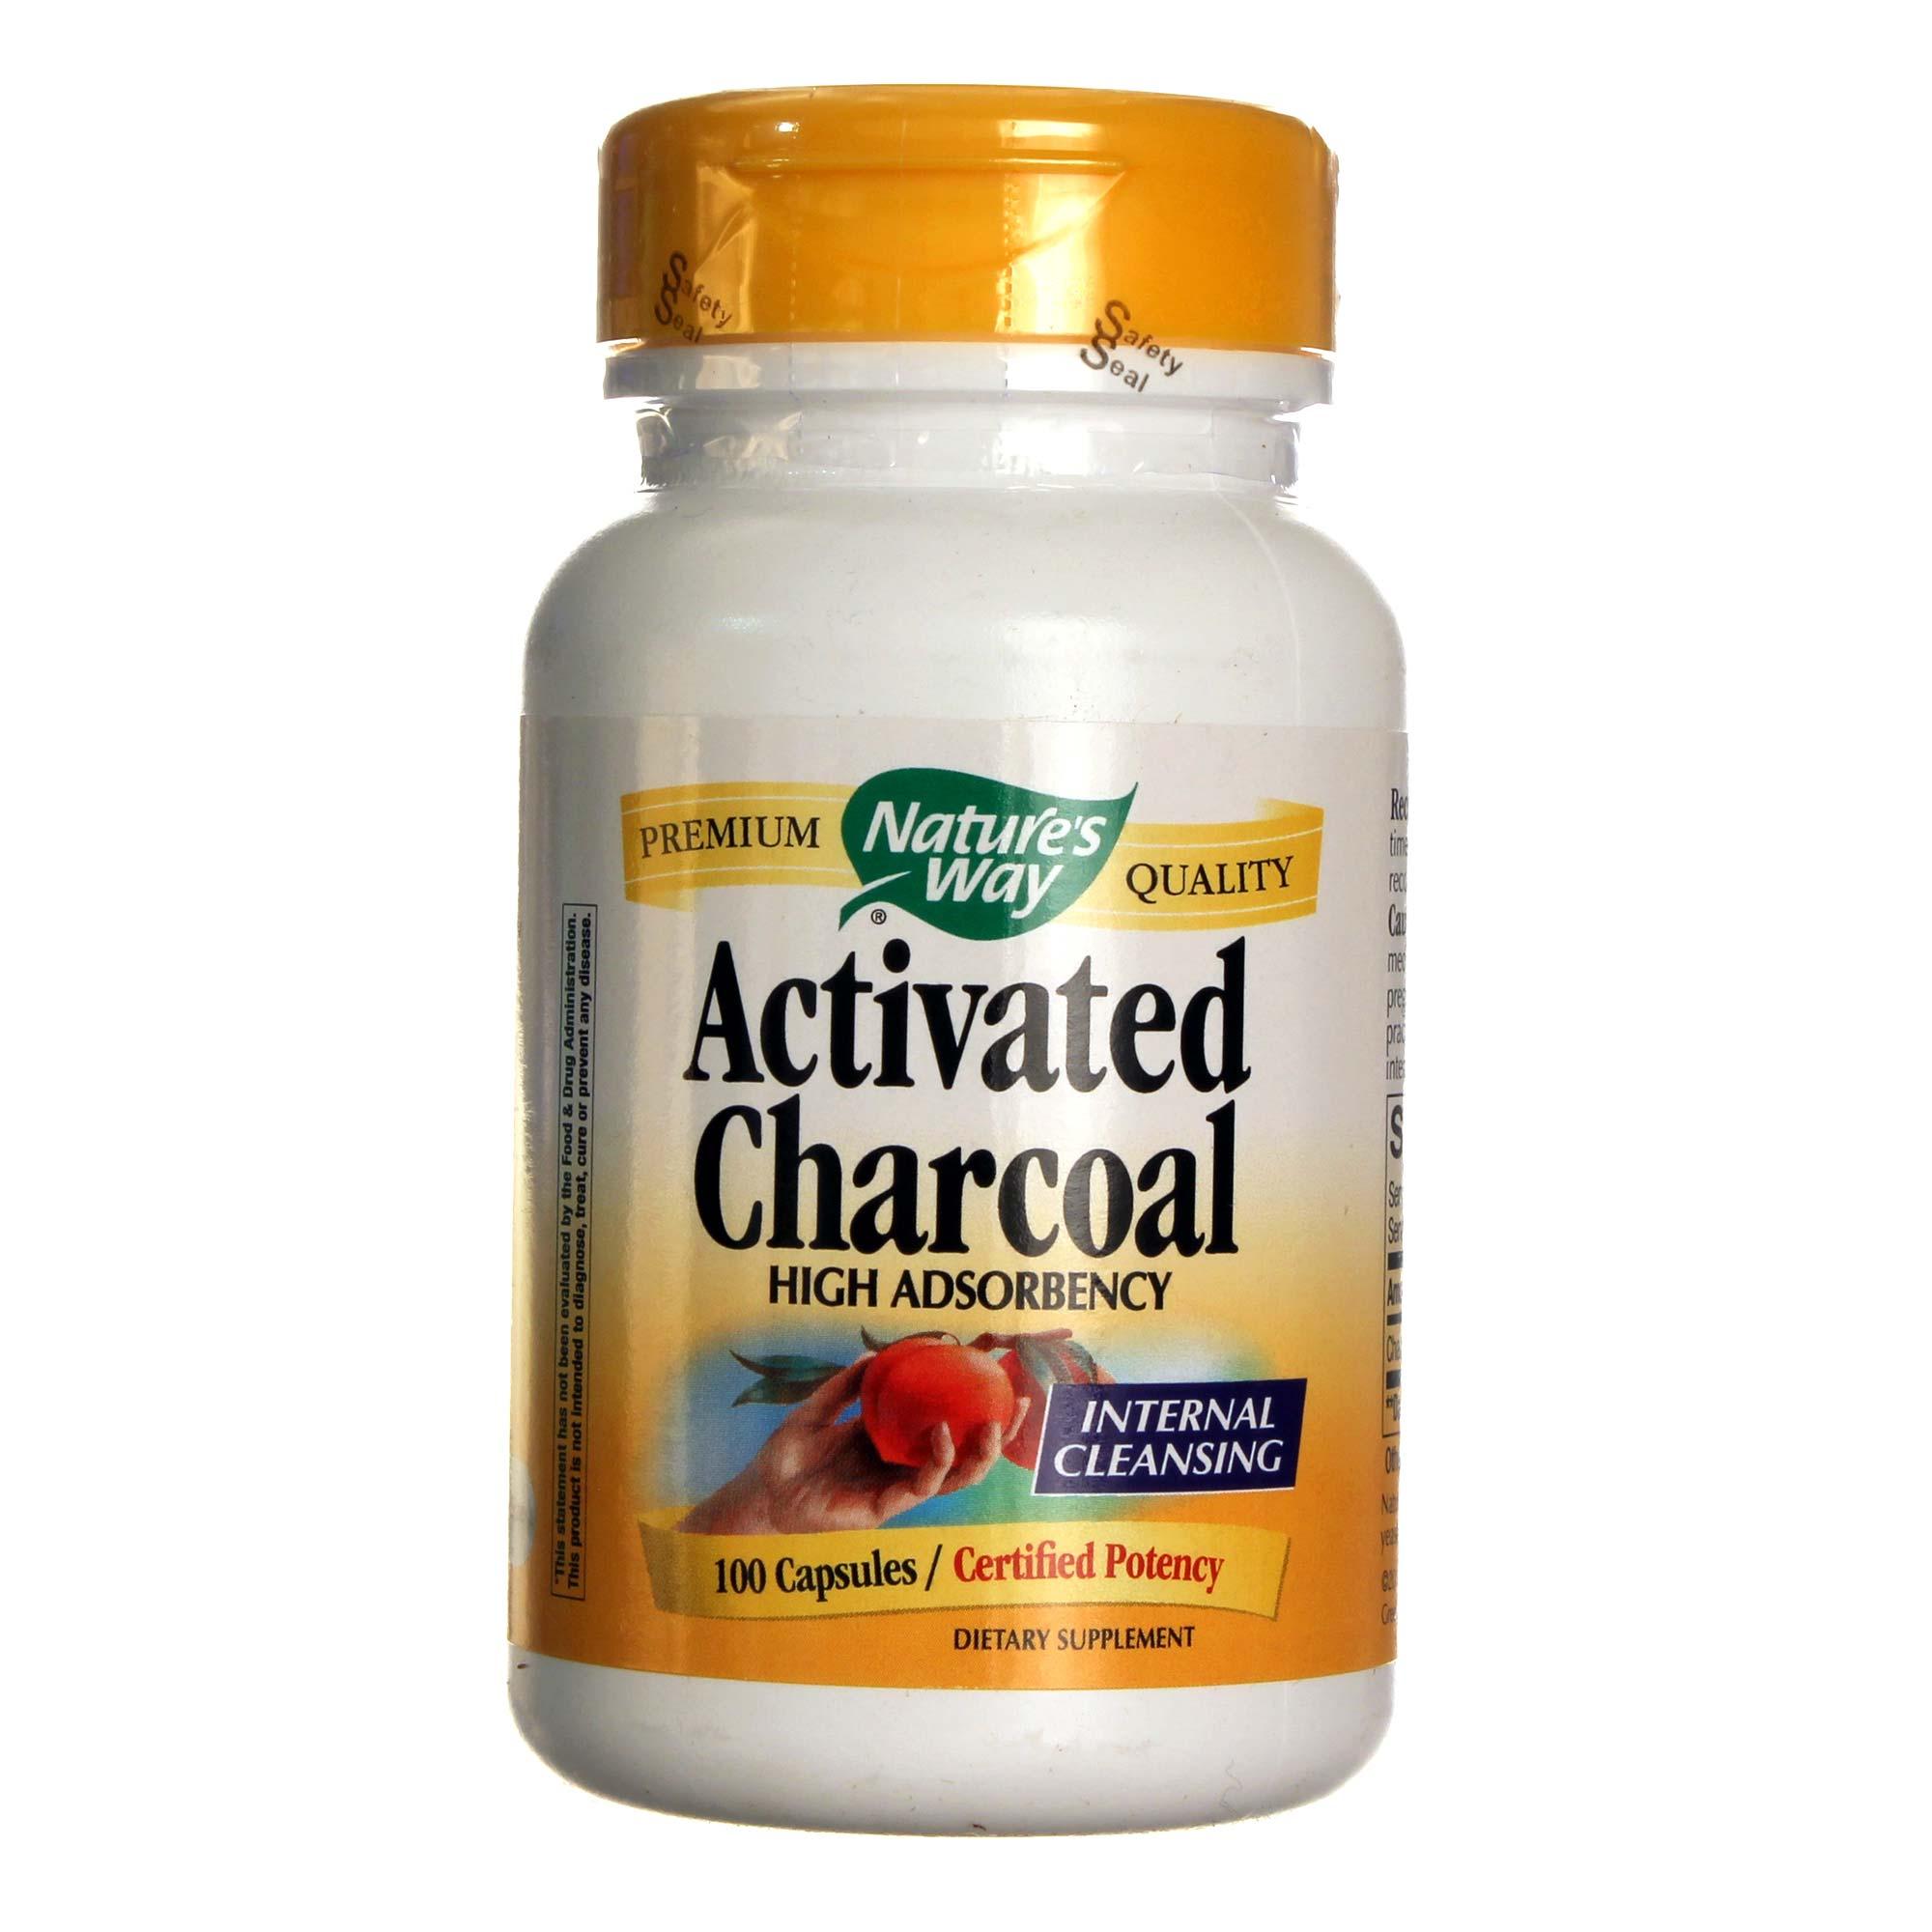 Nature's Way Activated Charcoal - 100 Caps - eVitamins